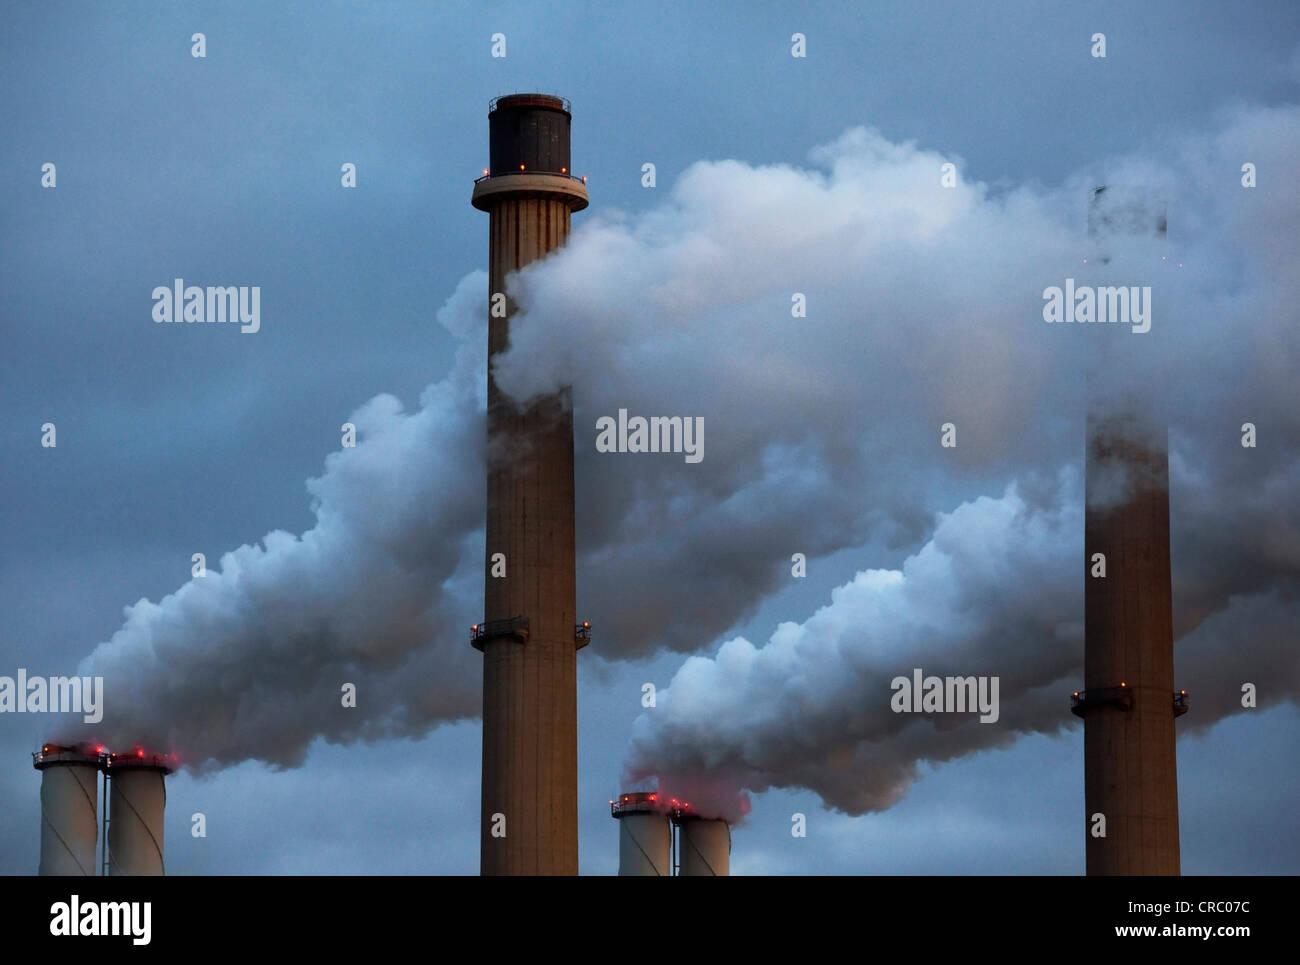 Smoke pouring from factory smokestacks - Stock Image